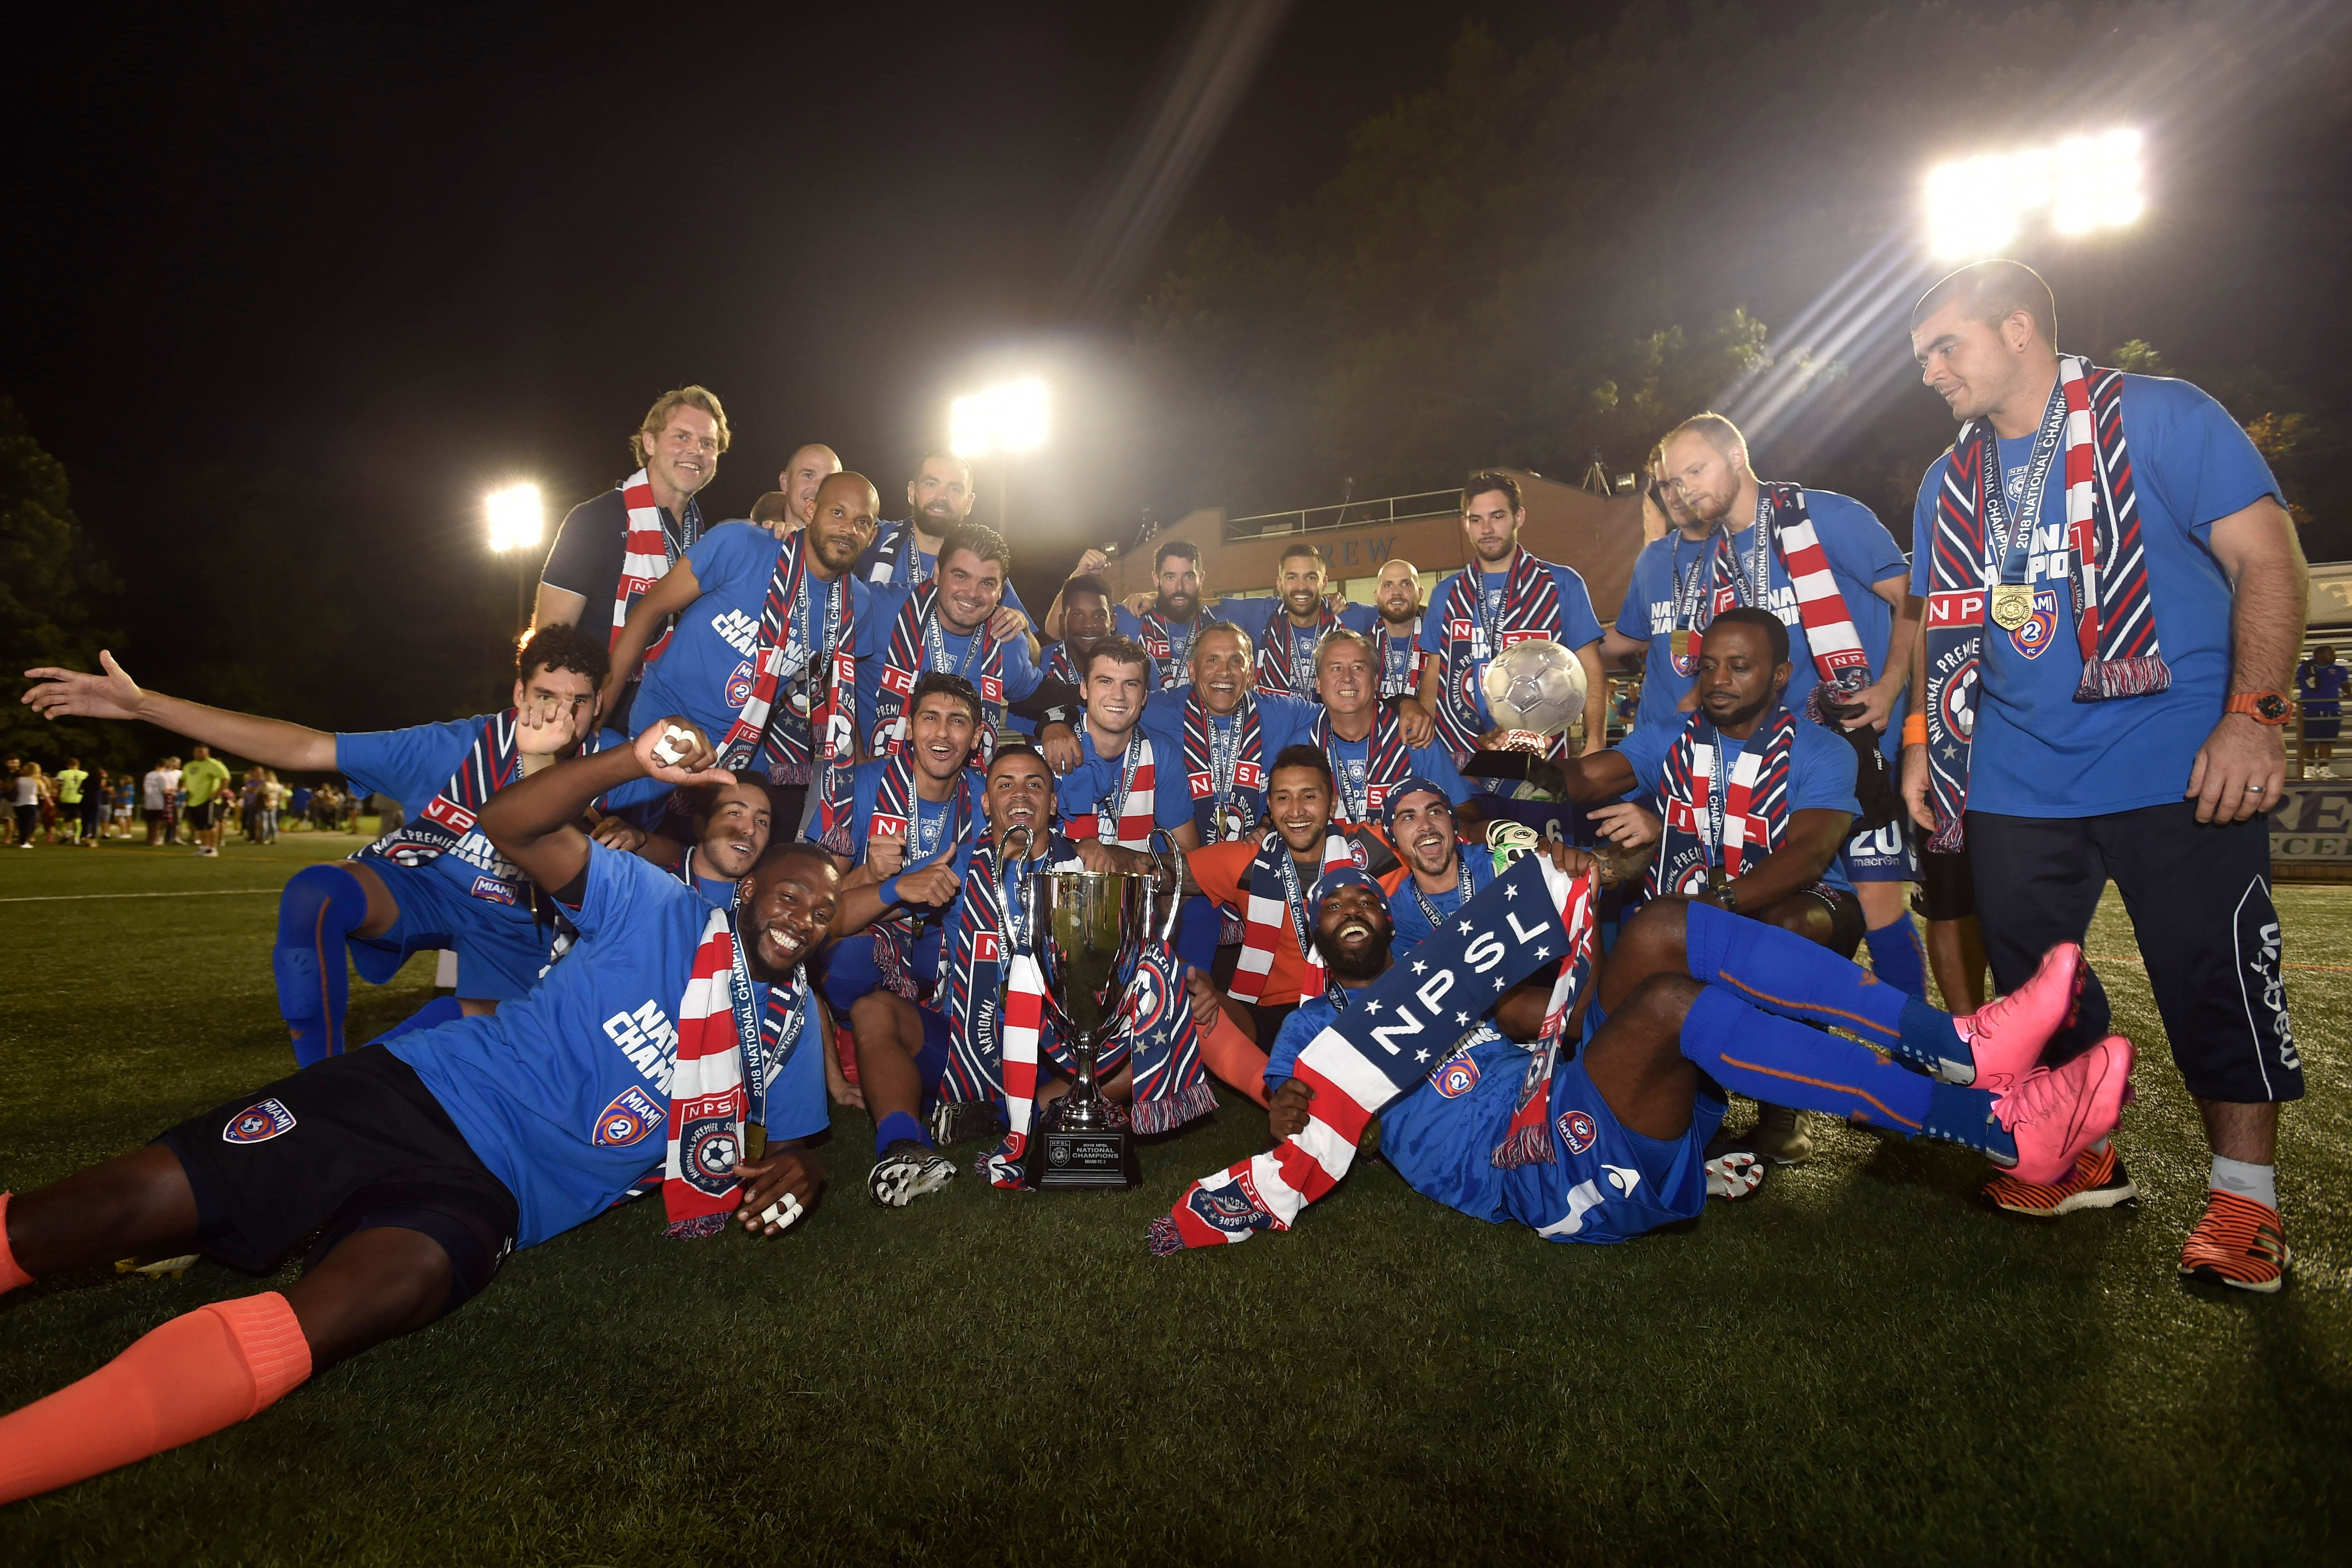 Recap The Miami Fc 2 Crowned National Champions Miami Fc